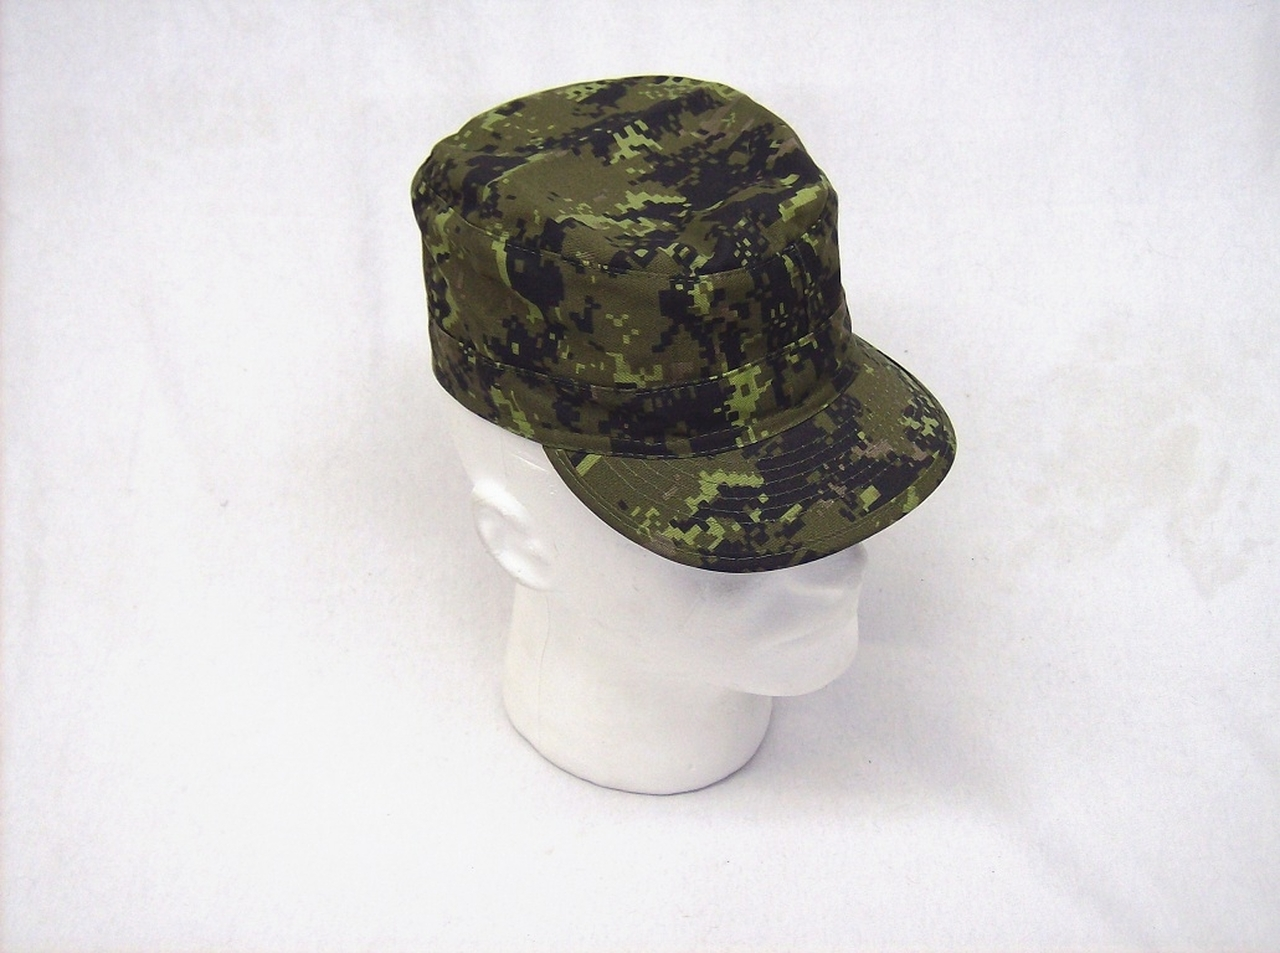 e0d8876e3 Canadian Military Style Patrol Cap - Hero Outdoors